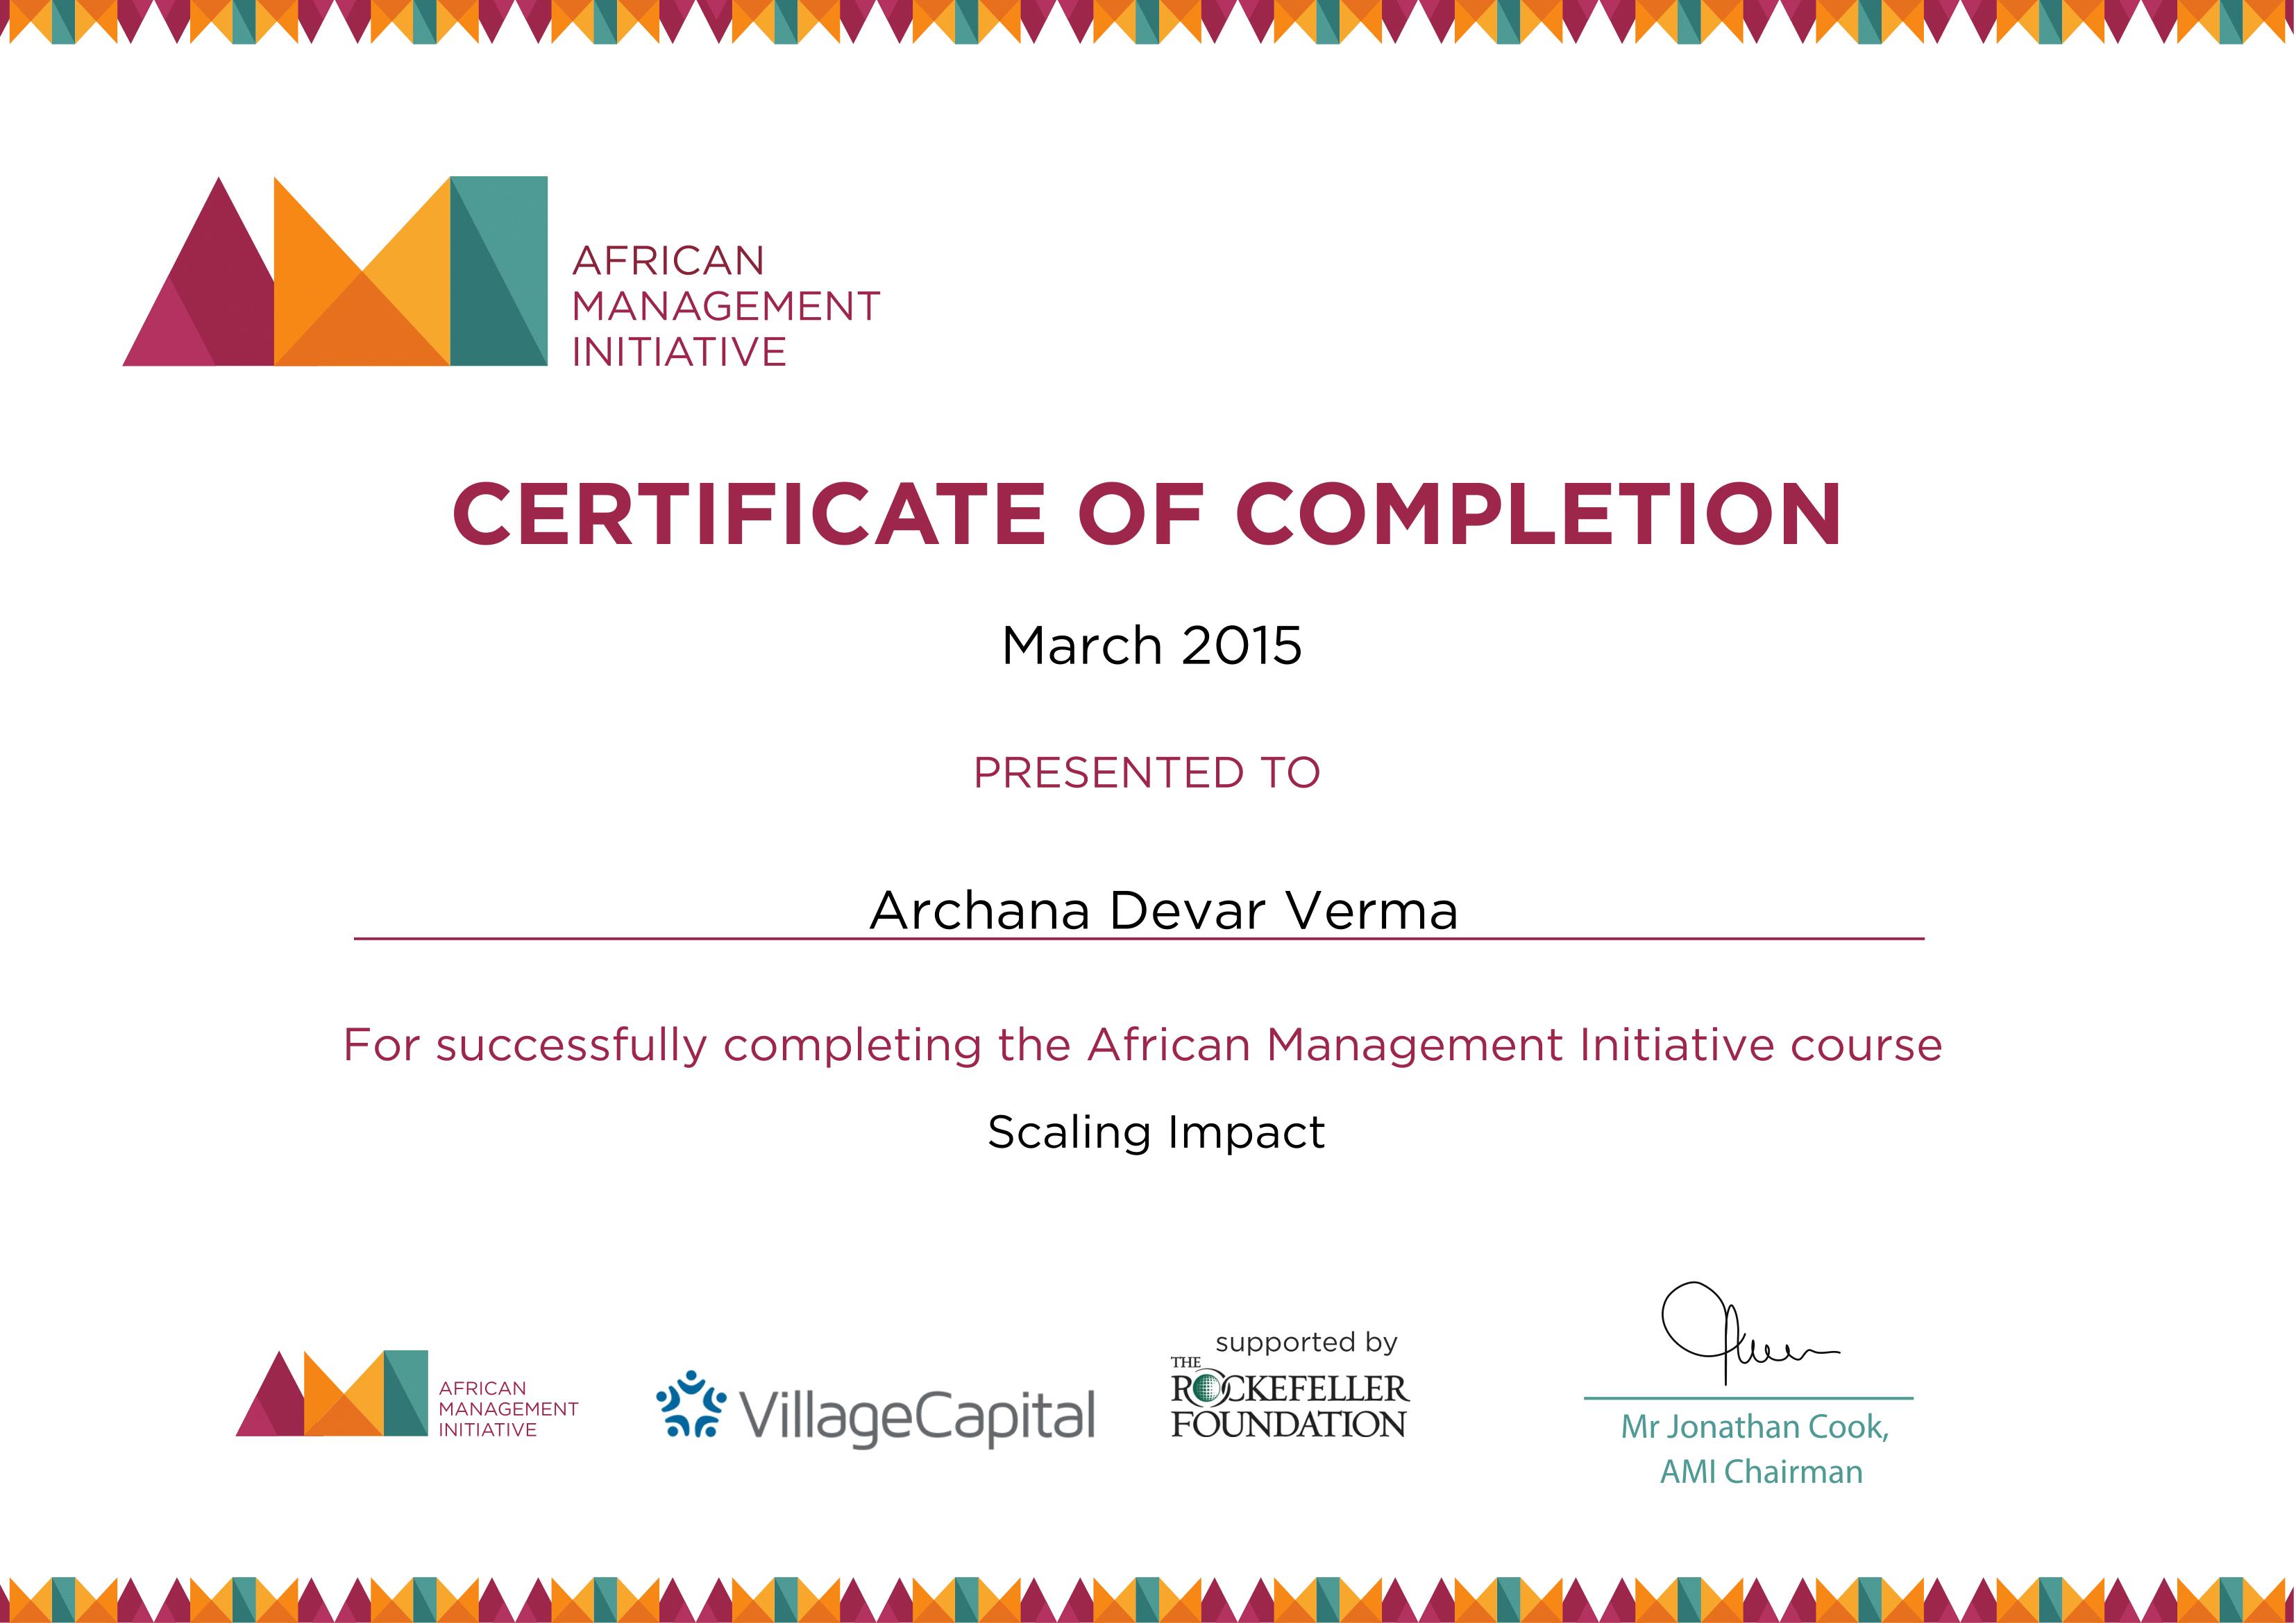 Scaling impact certificate sample 1